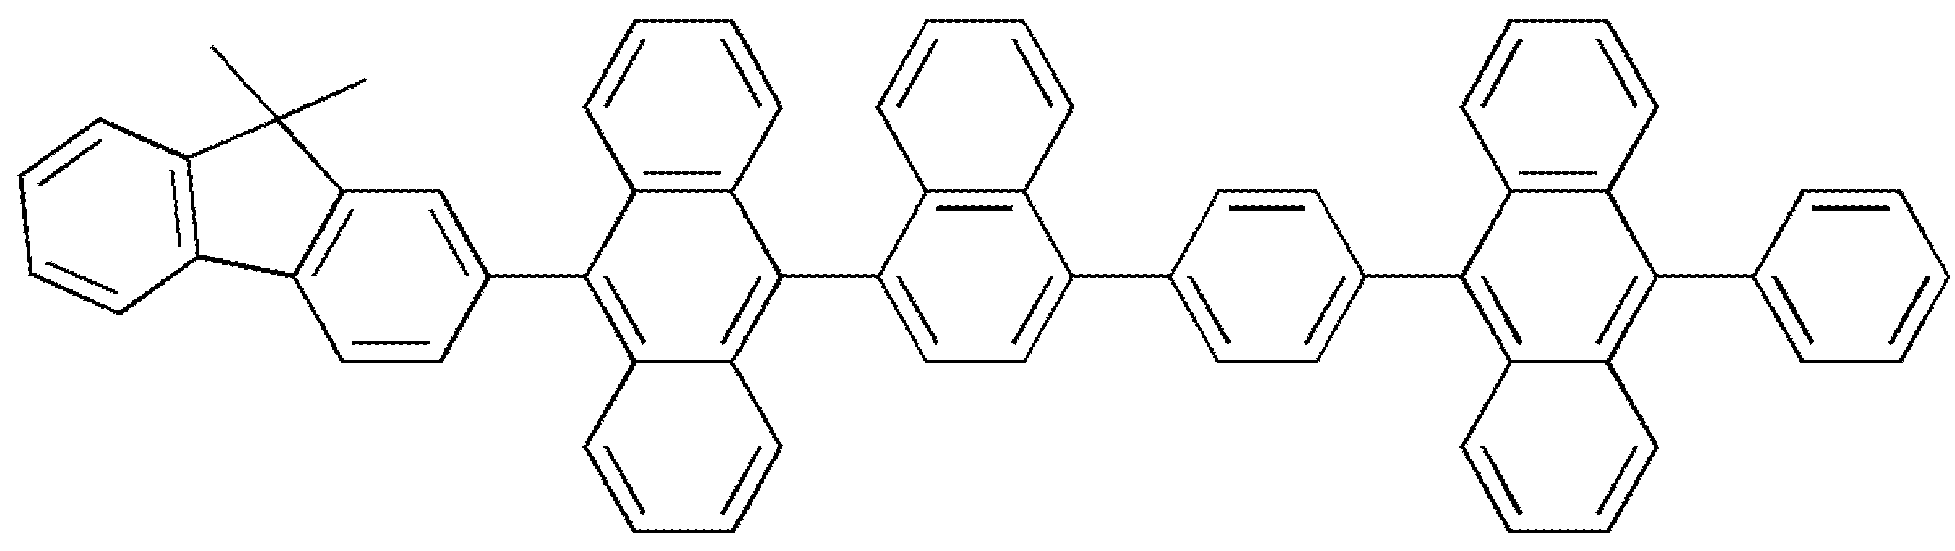 Figure 112007087103673-pat00668